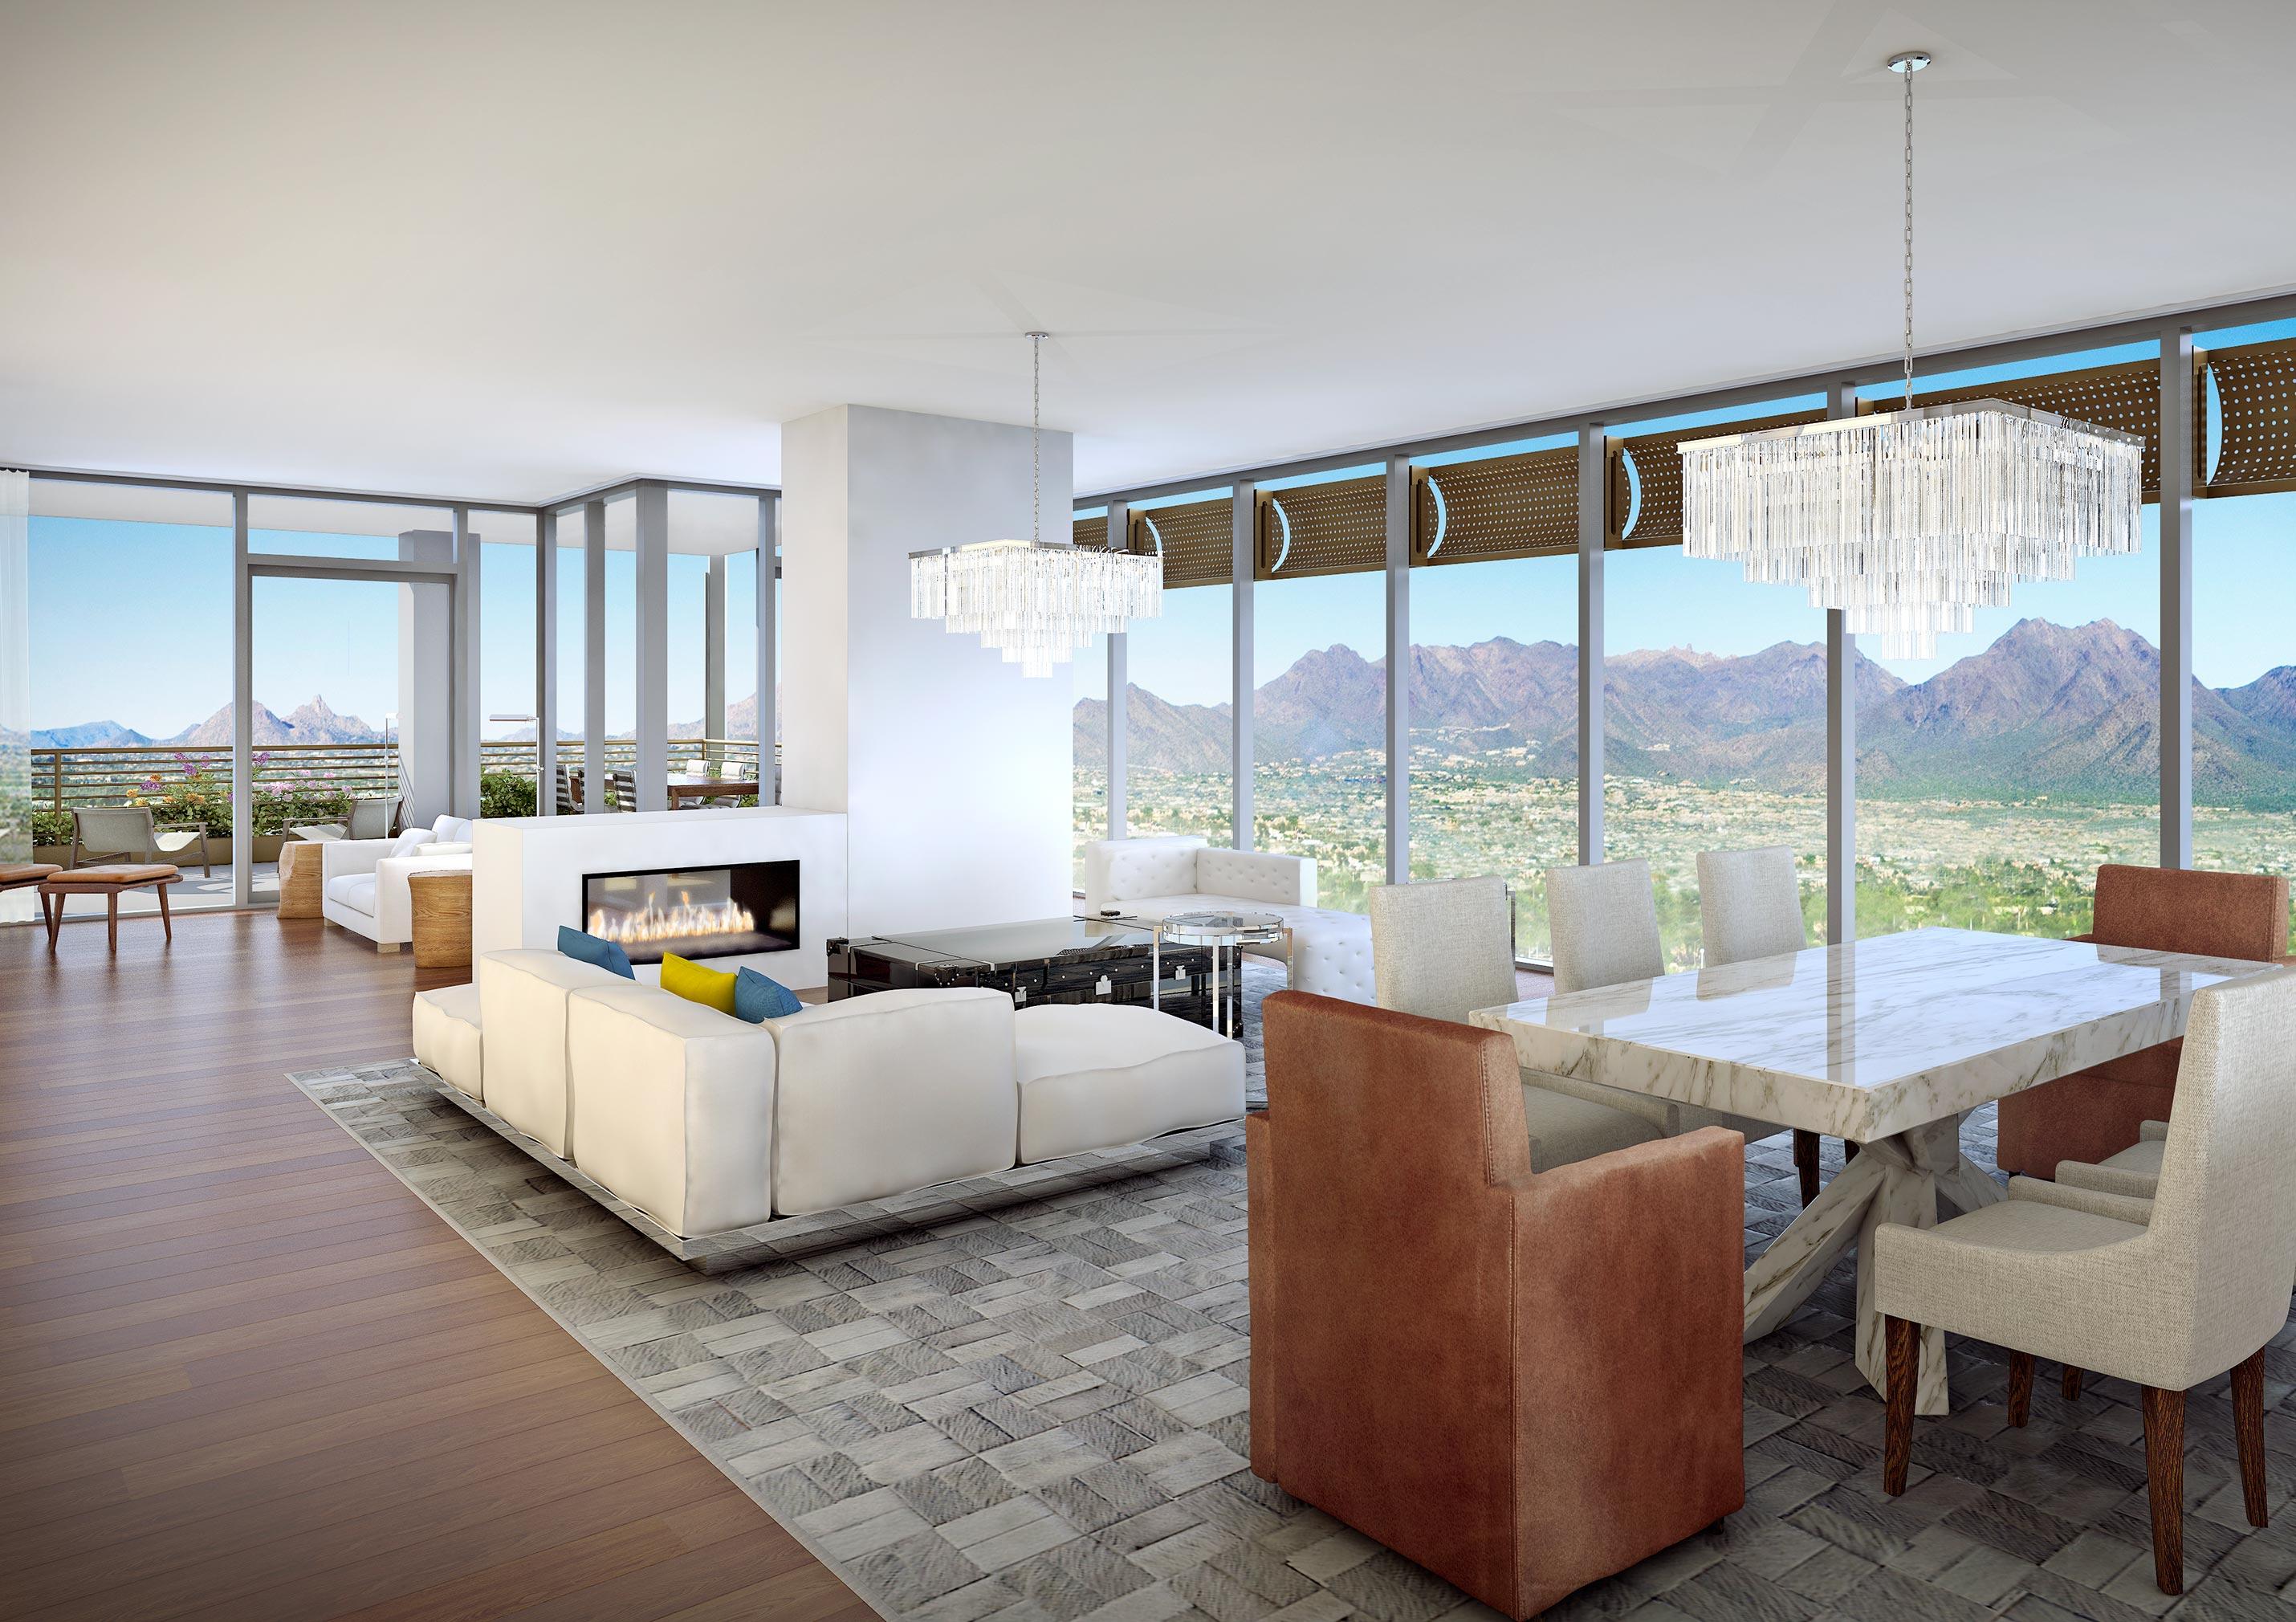 Developers pitch projects to urbanize Kierland in northeast Phoenix